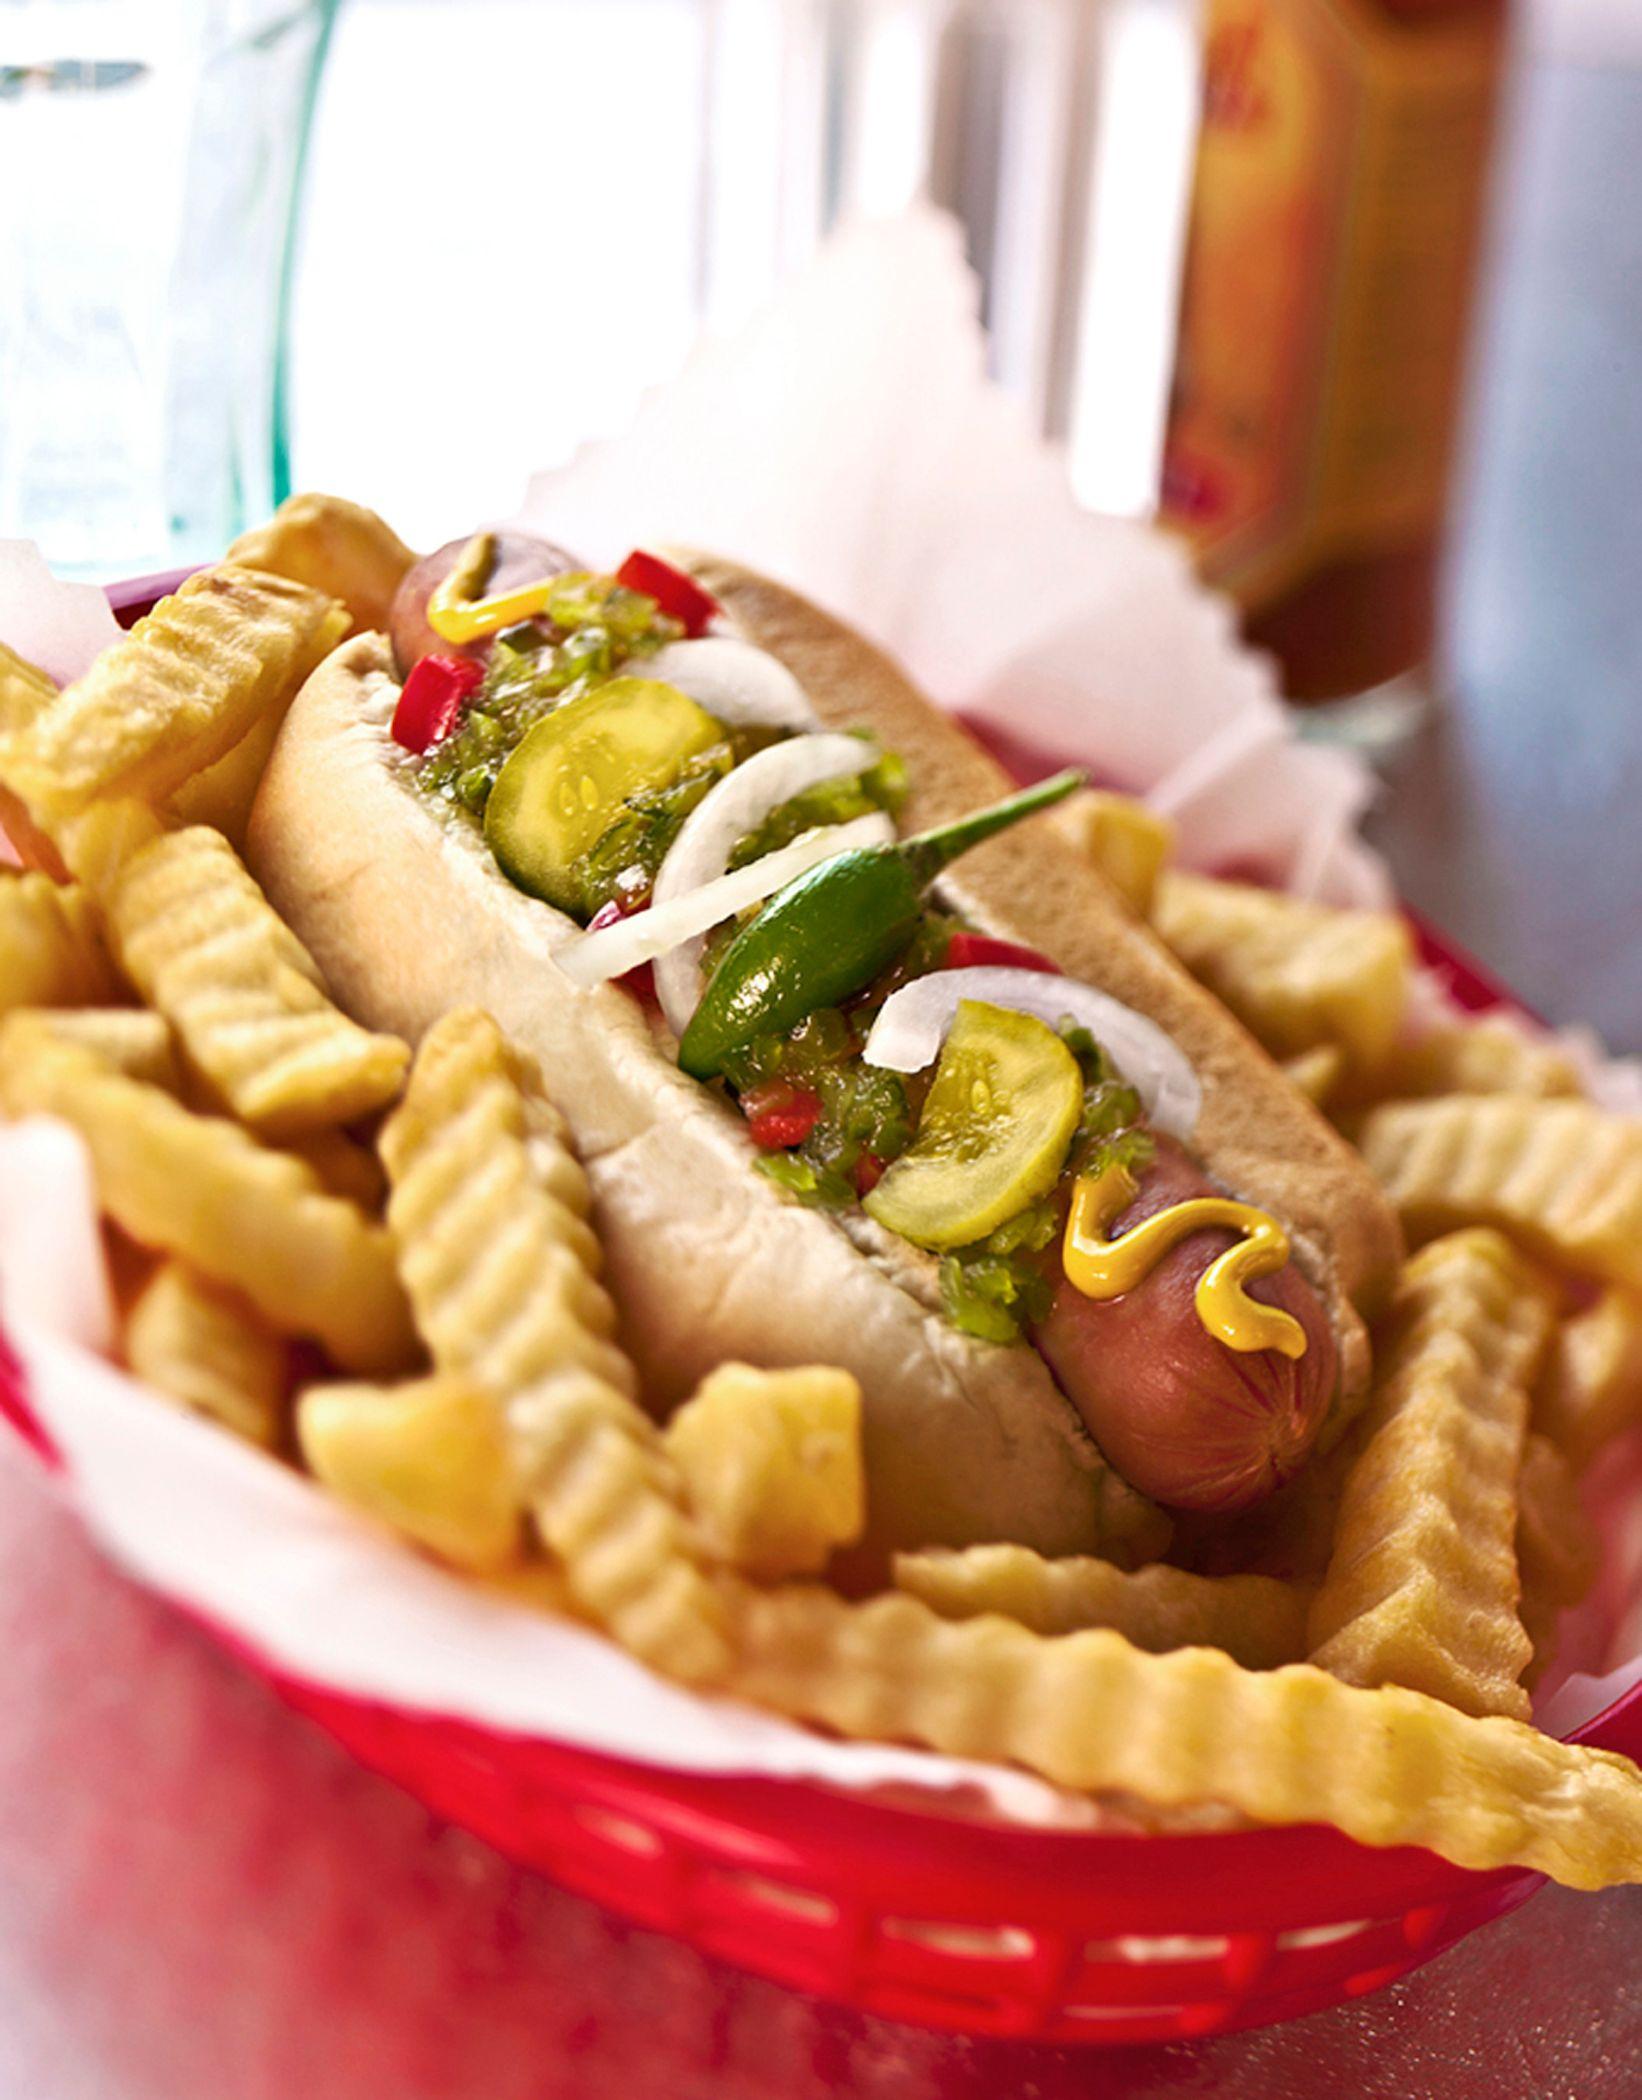 Hotdog and French Fries 2100 .jpg